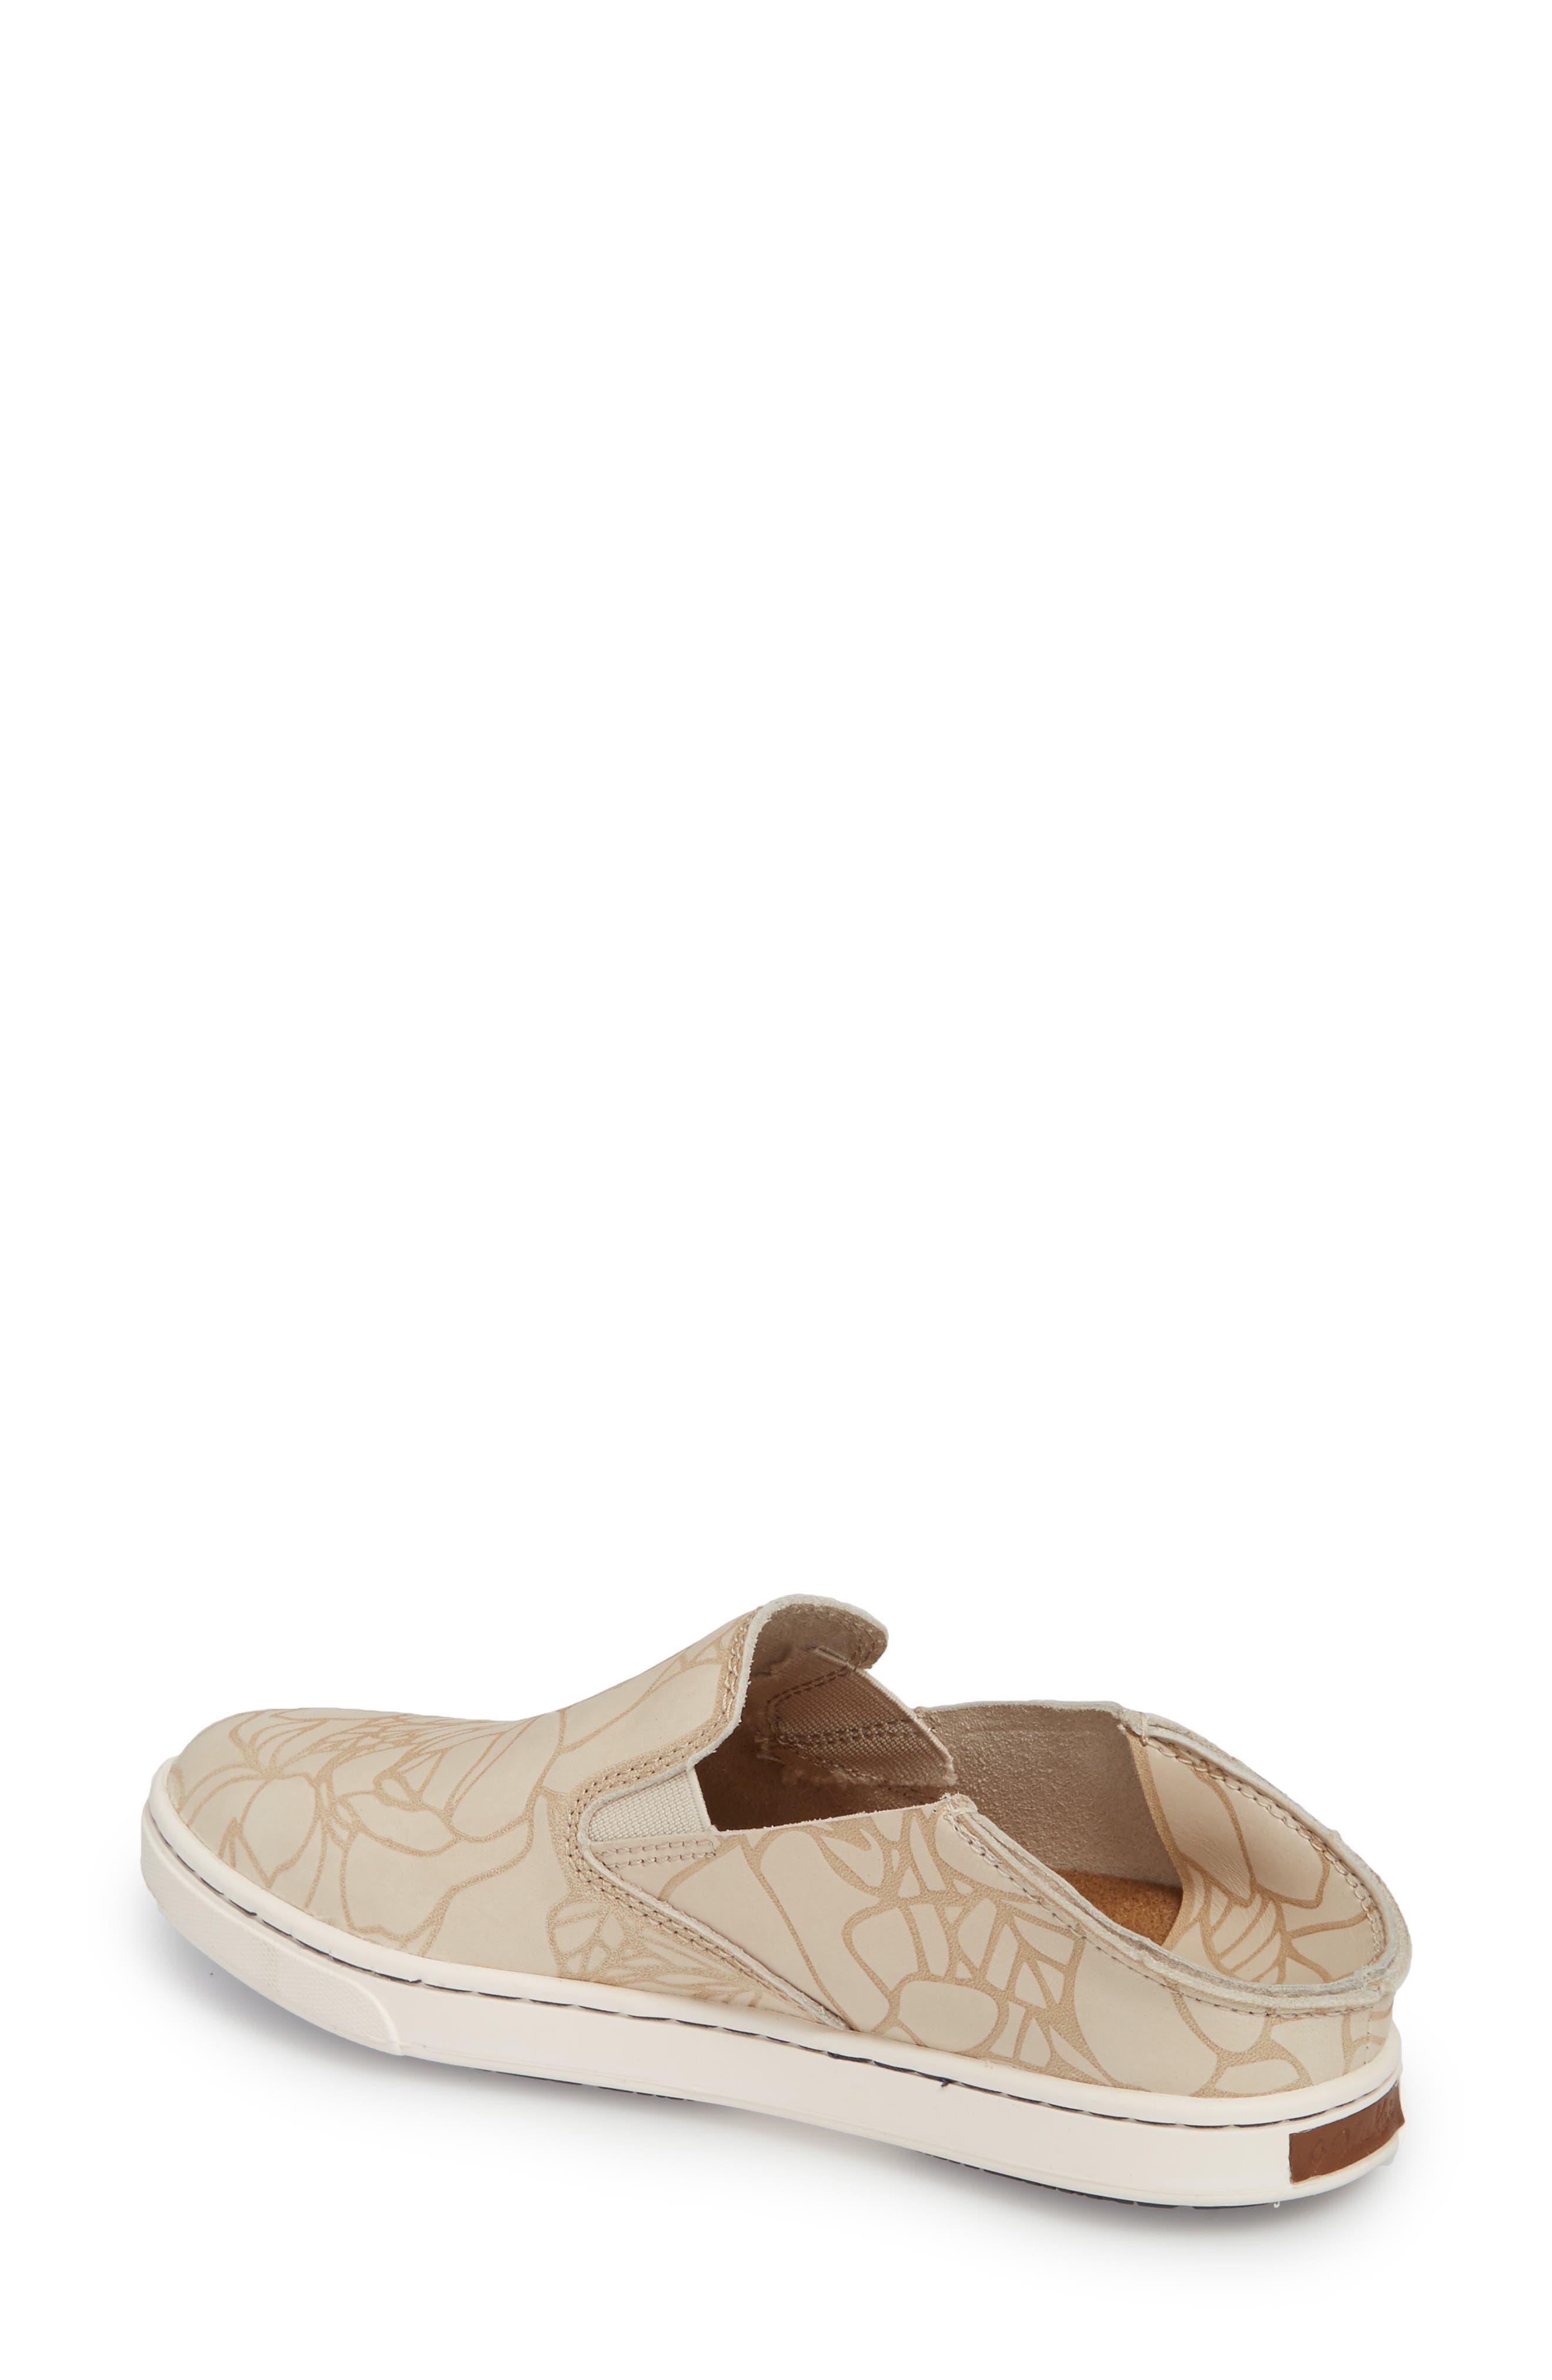 Pehuea Lau Slip-On Sneaker,                             Alternate thumbnail 3, color,                             TAPA/ TAPA FABRIC